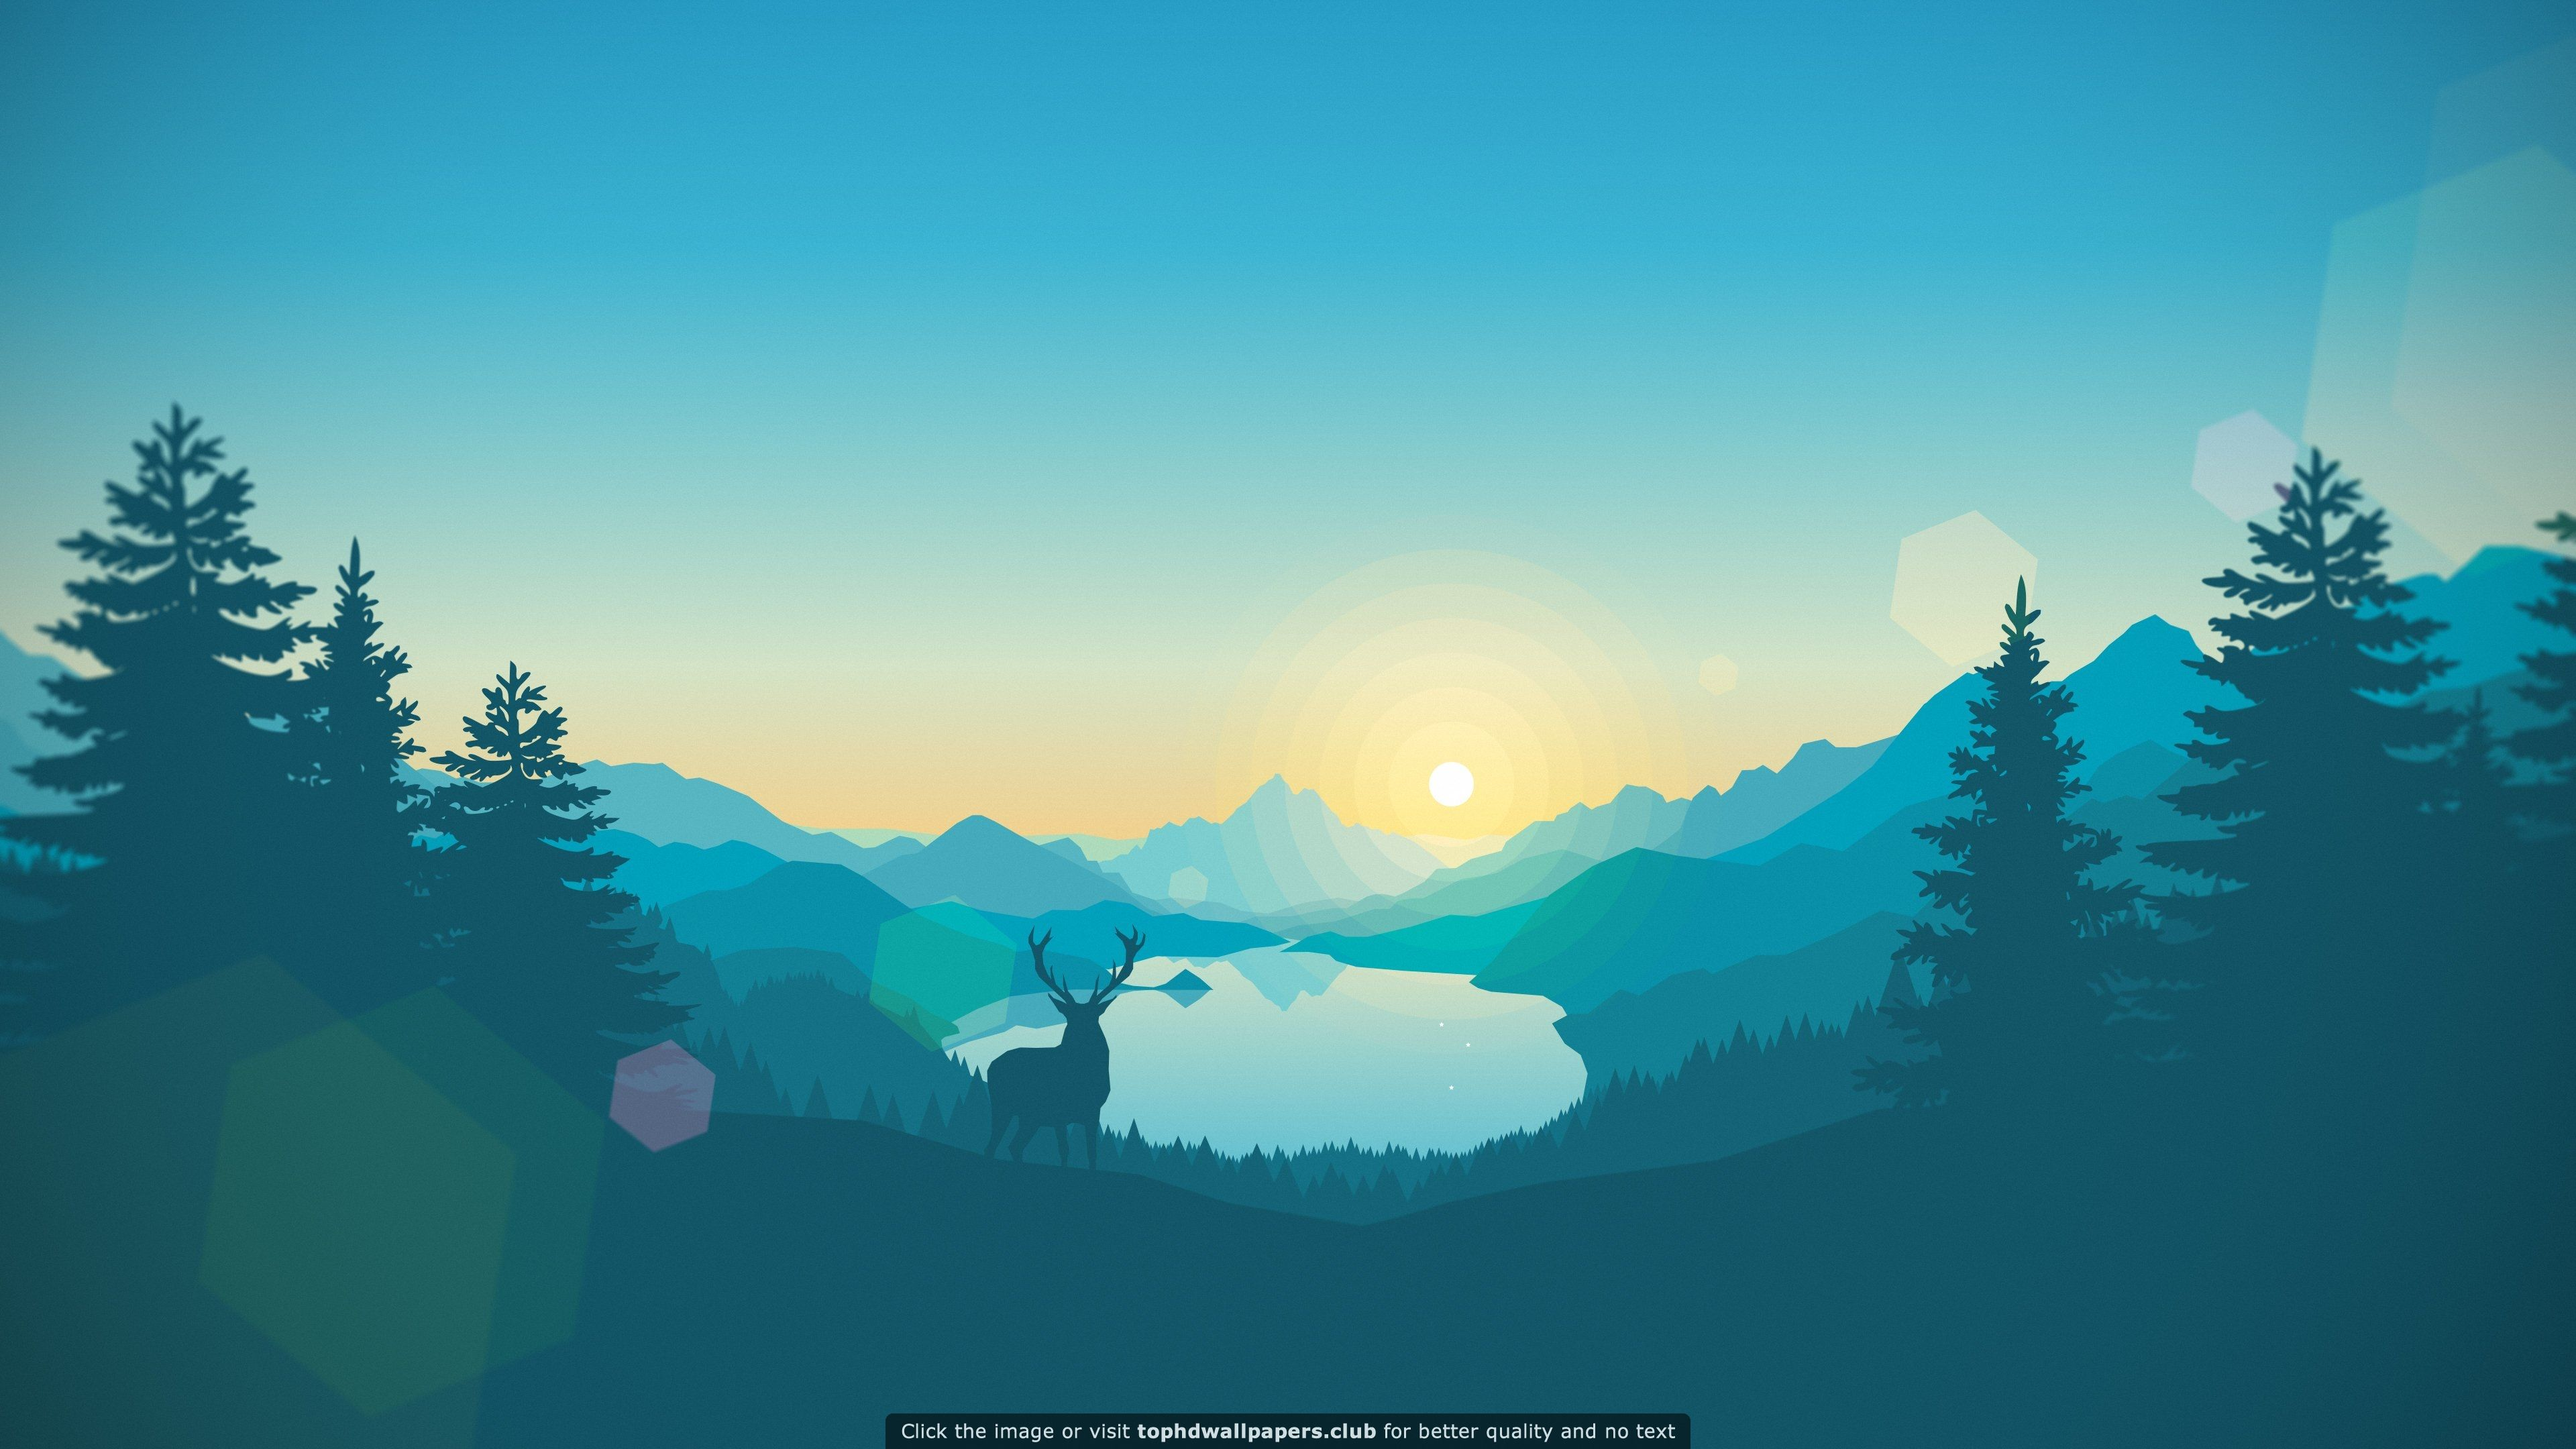 2560x1080 Pubg Game Wallpaper